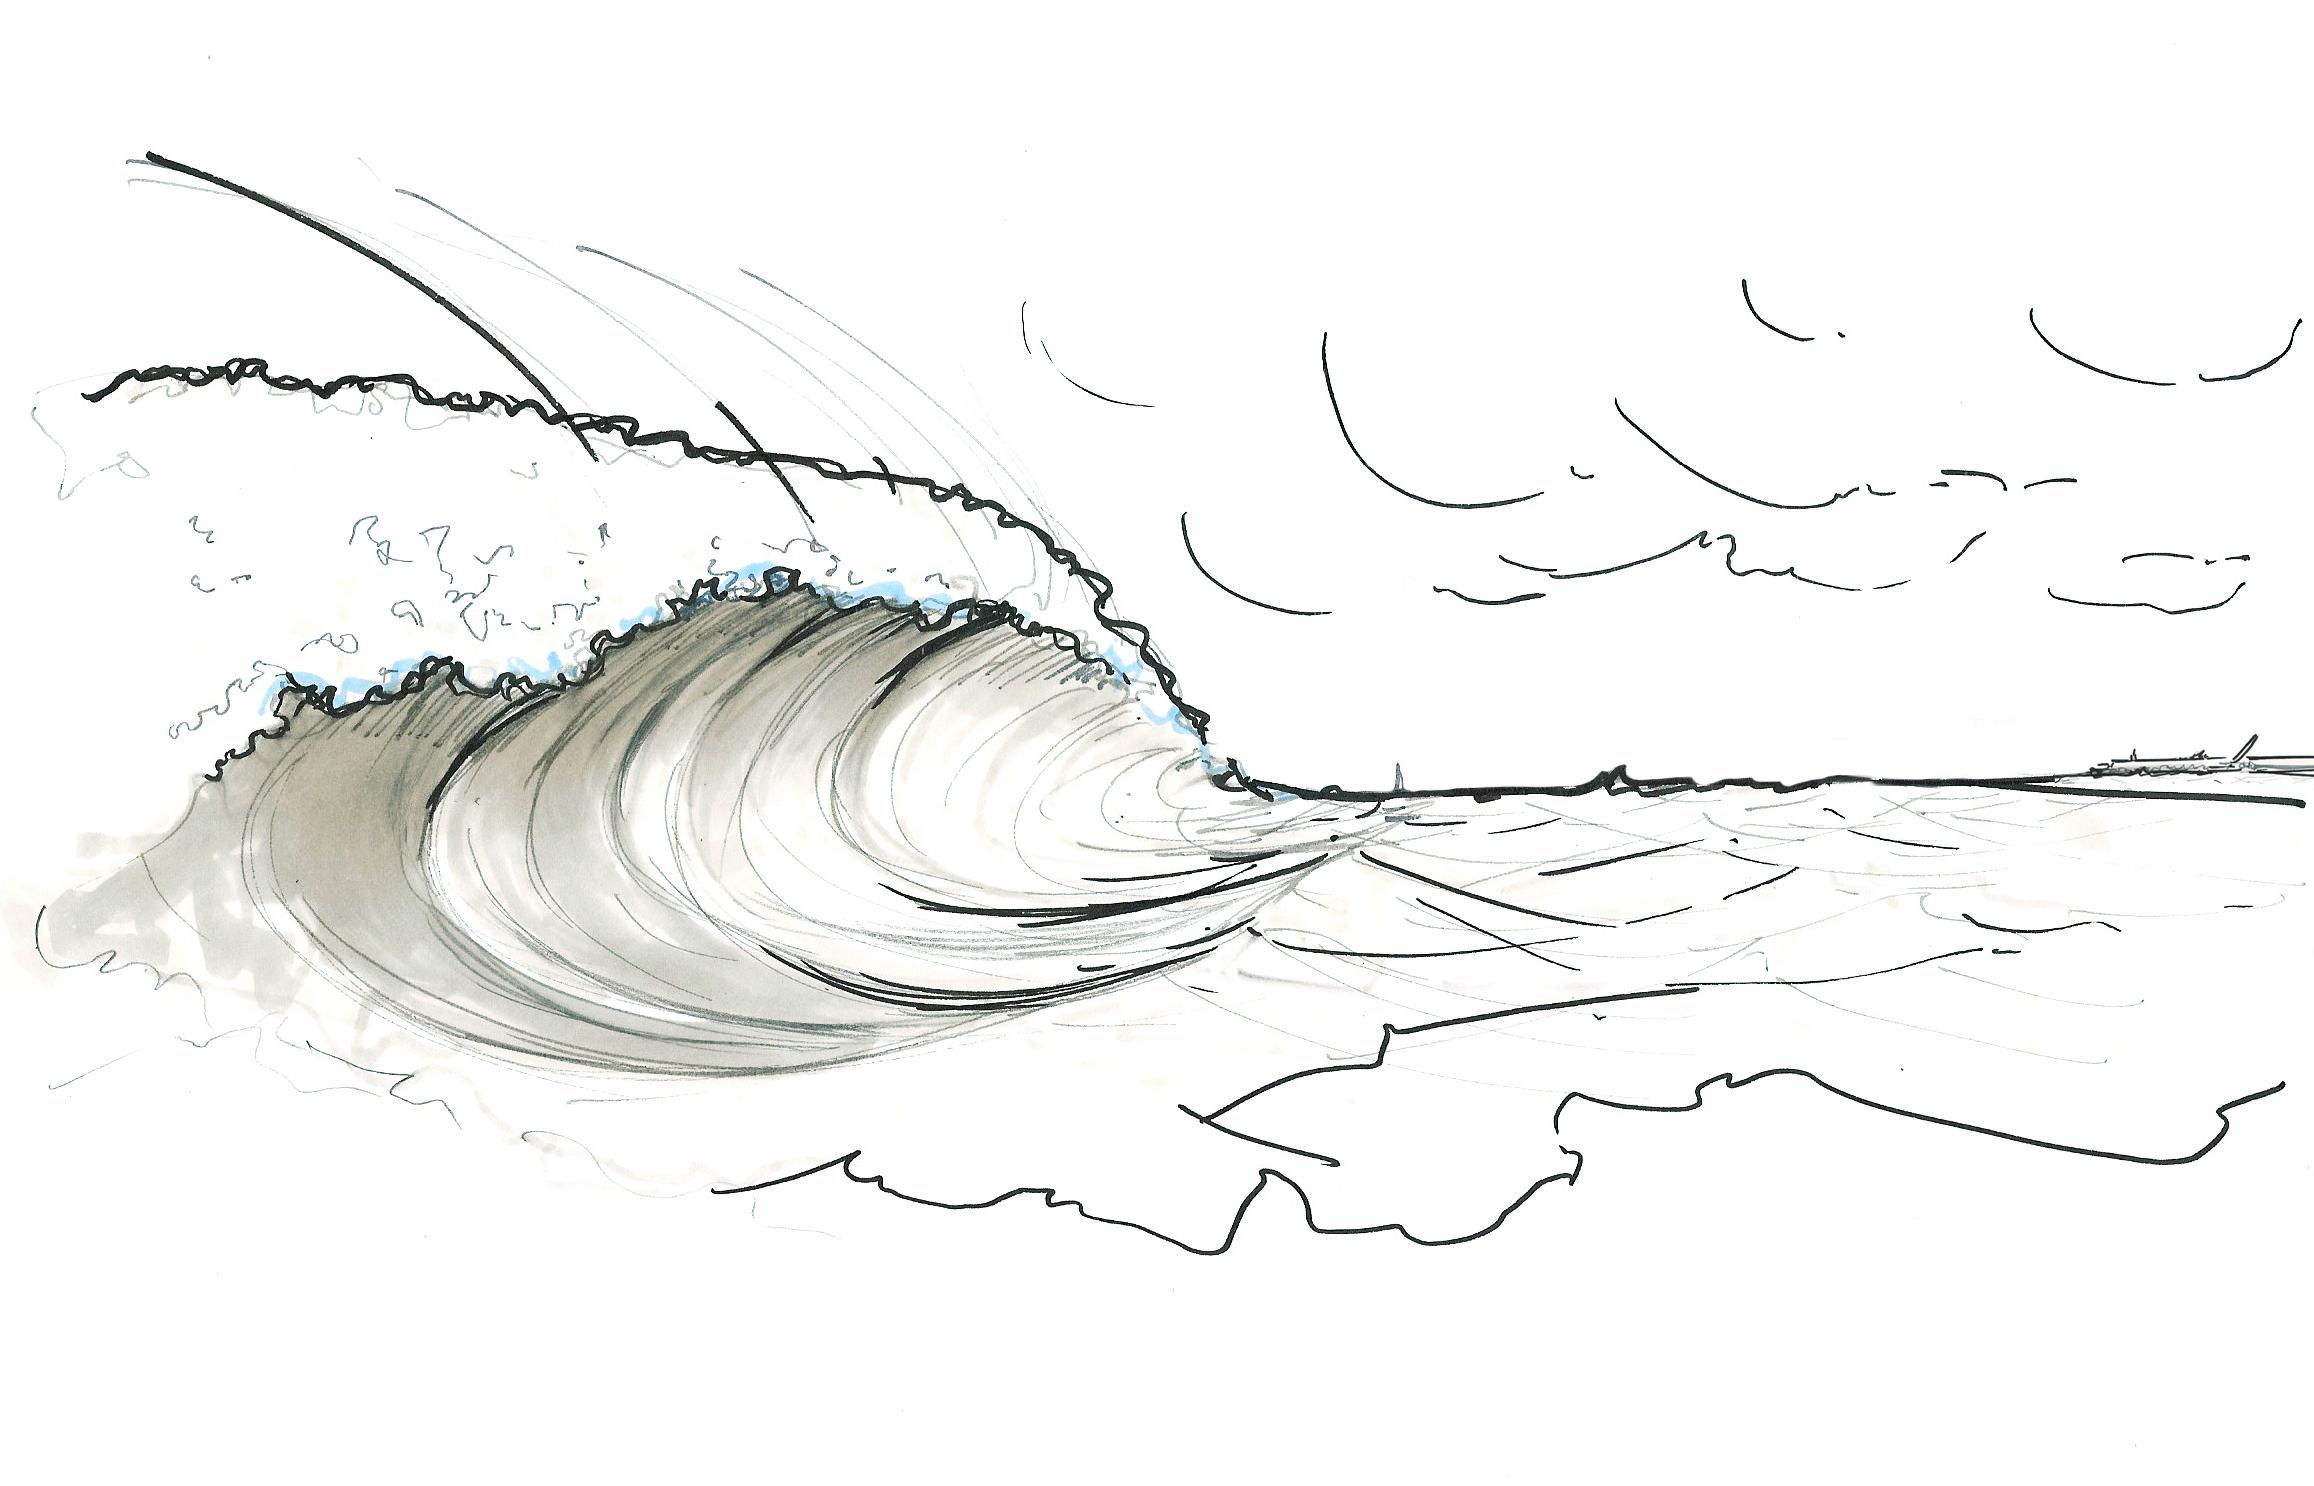 Wave illustration - France Energies Marines